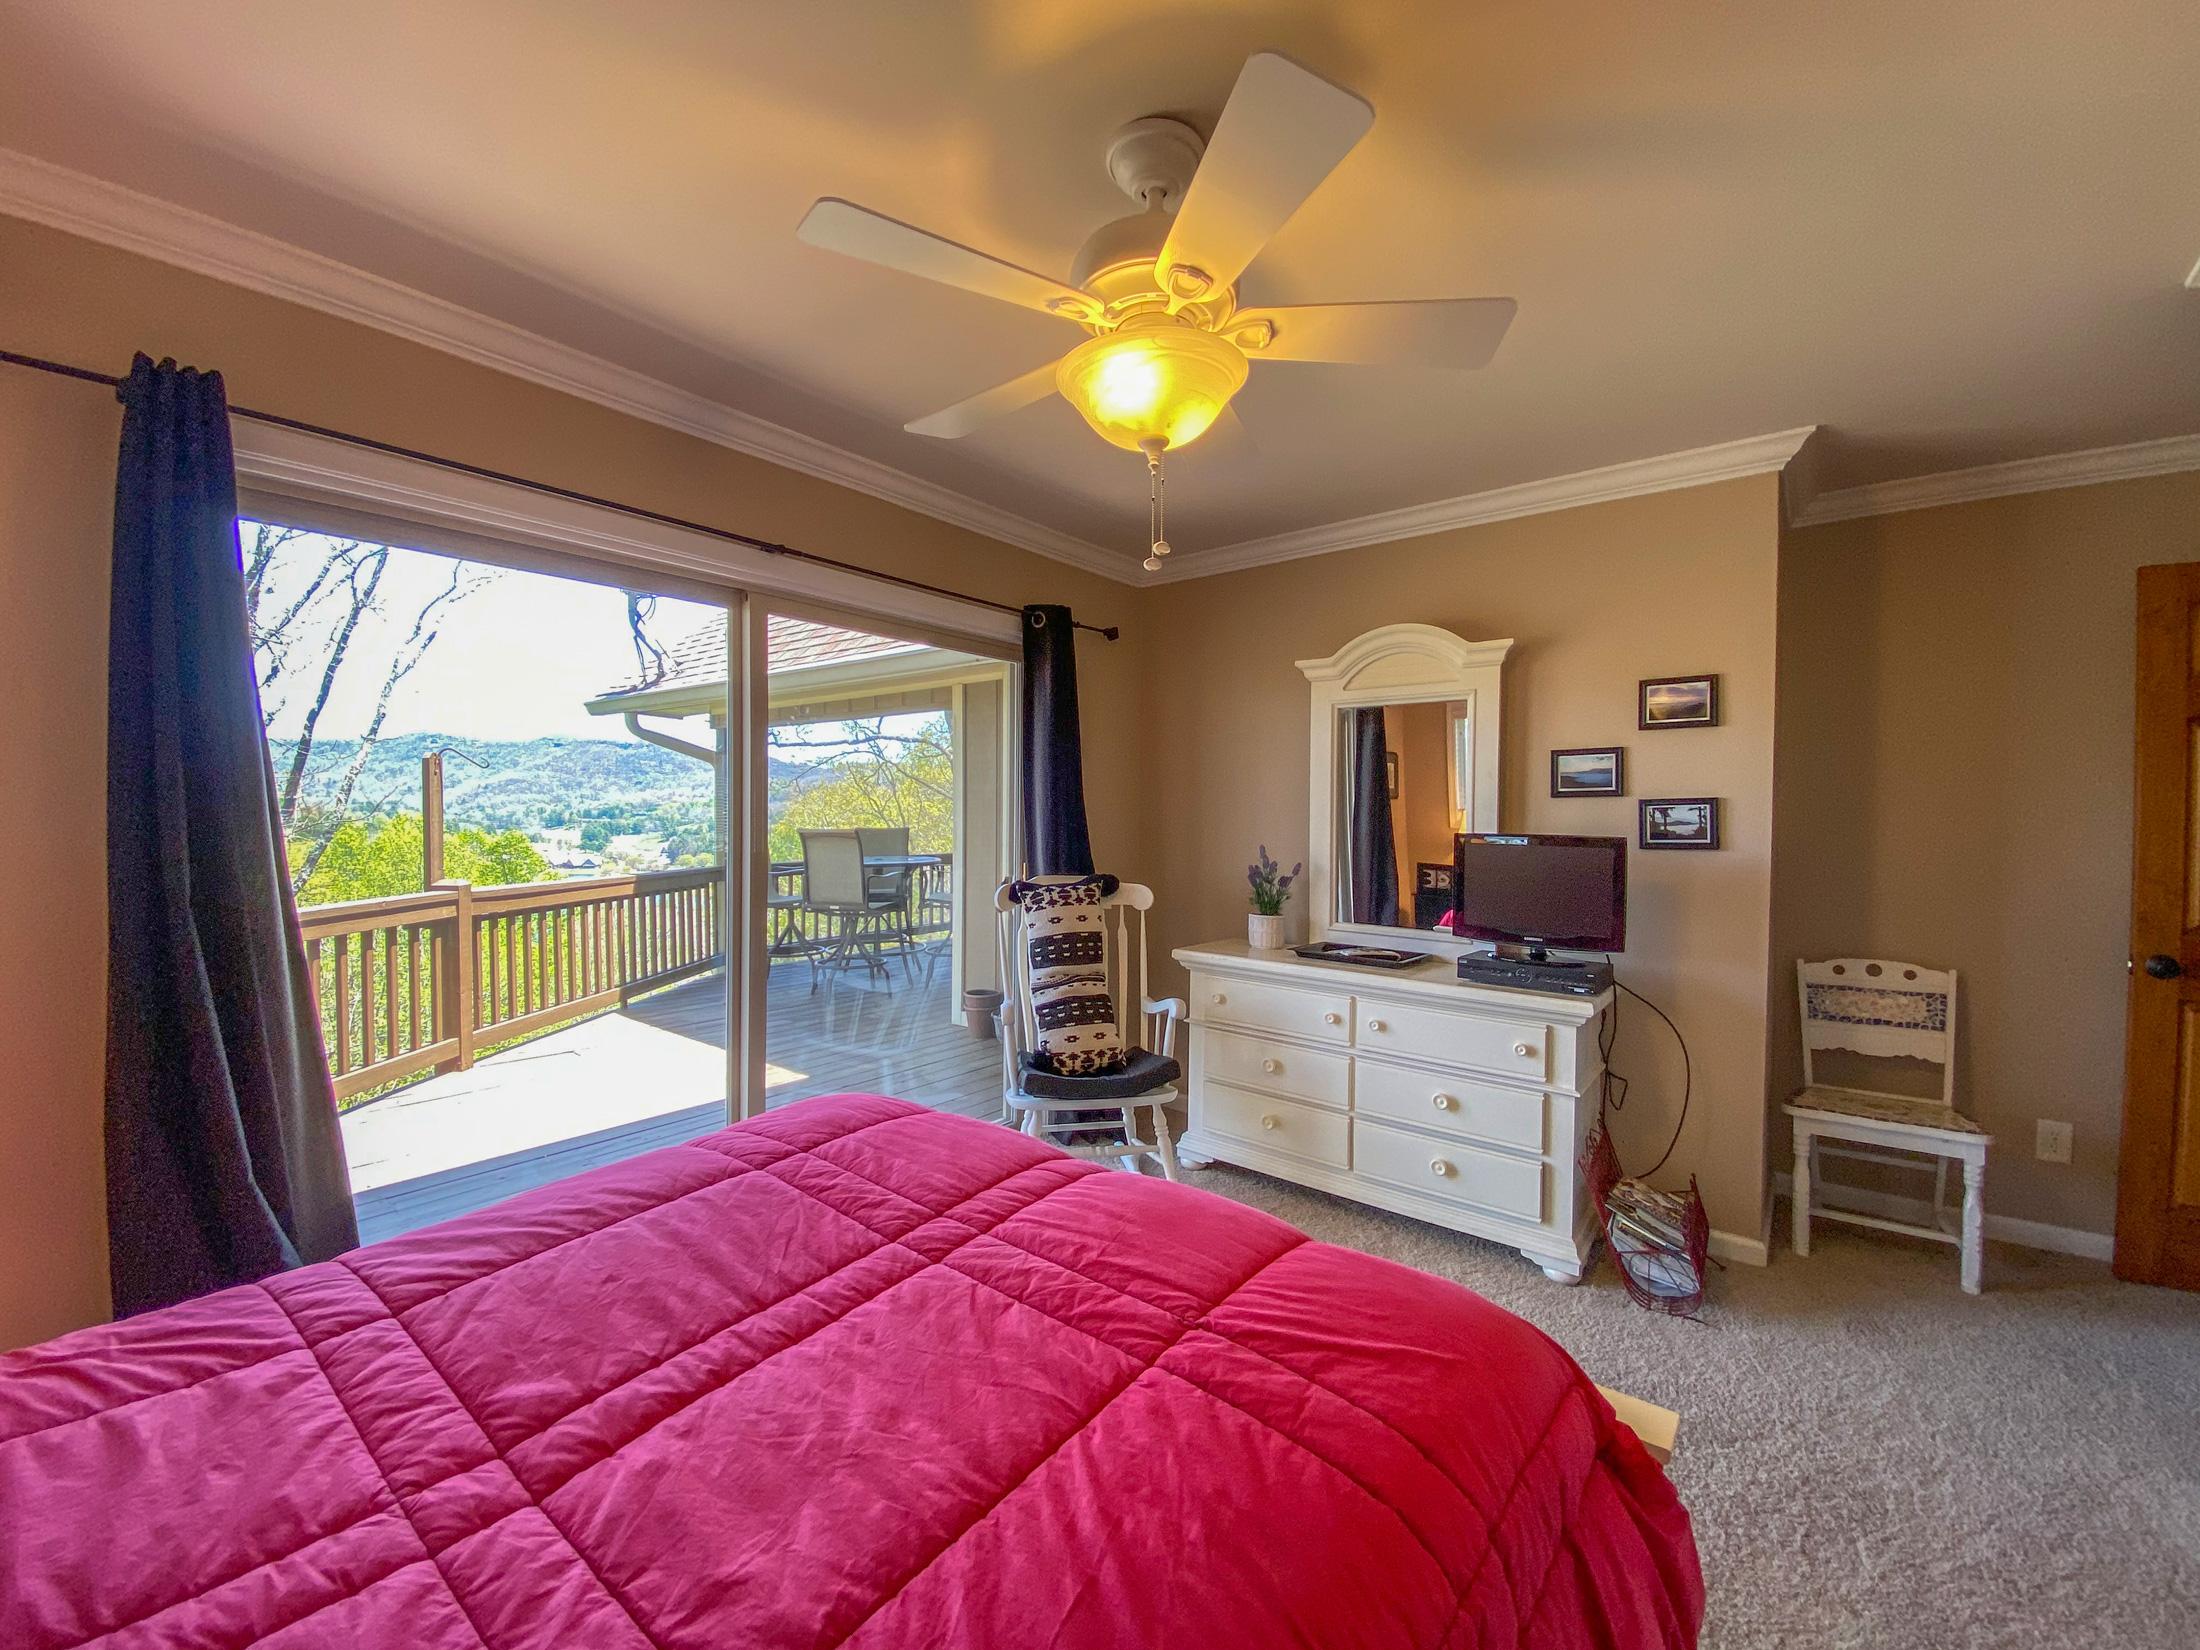 81 McClure Ln Sky Valley GA 30537 | MLS #8969983